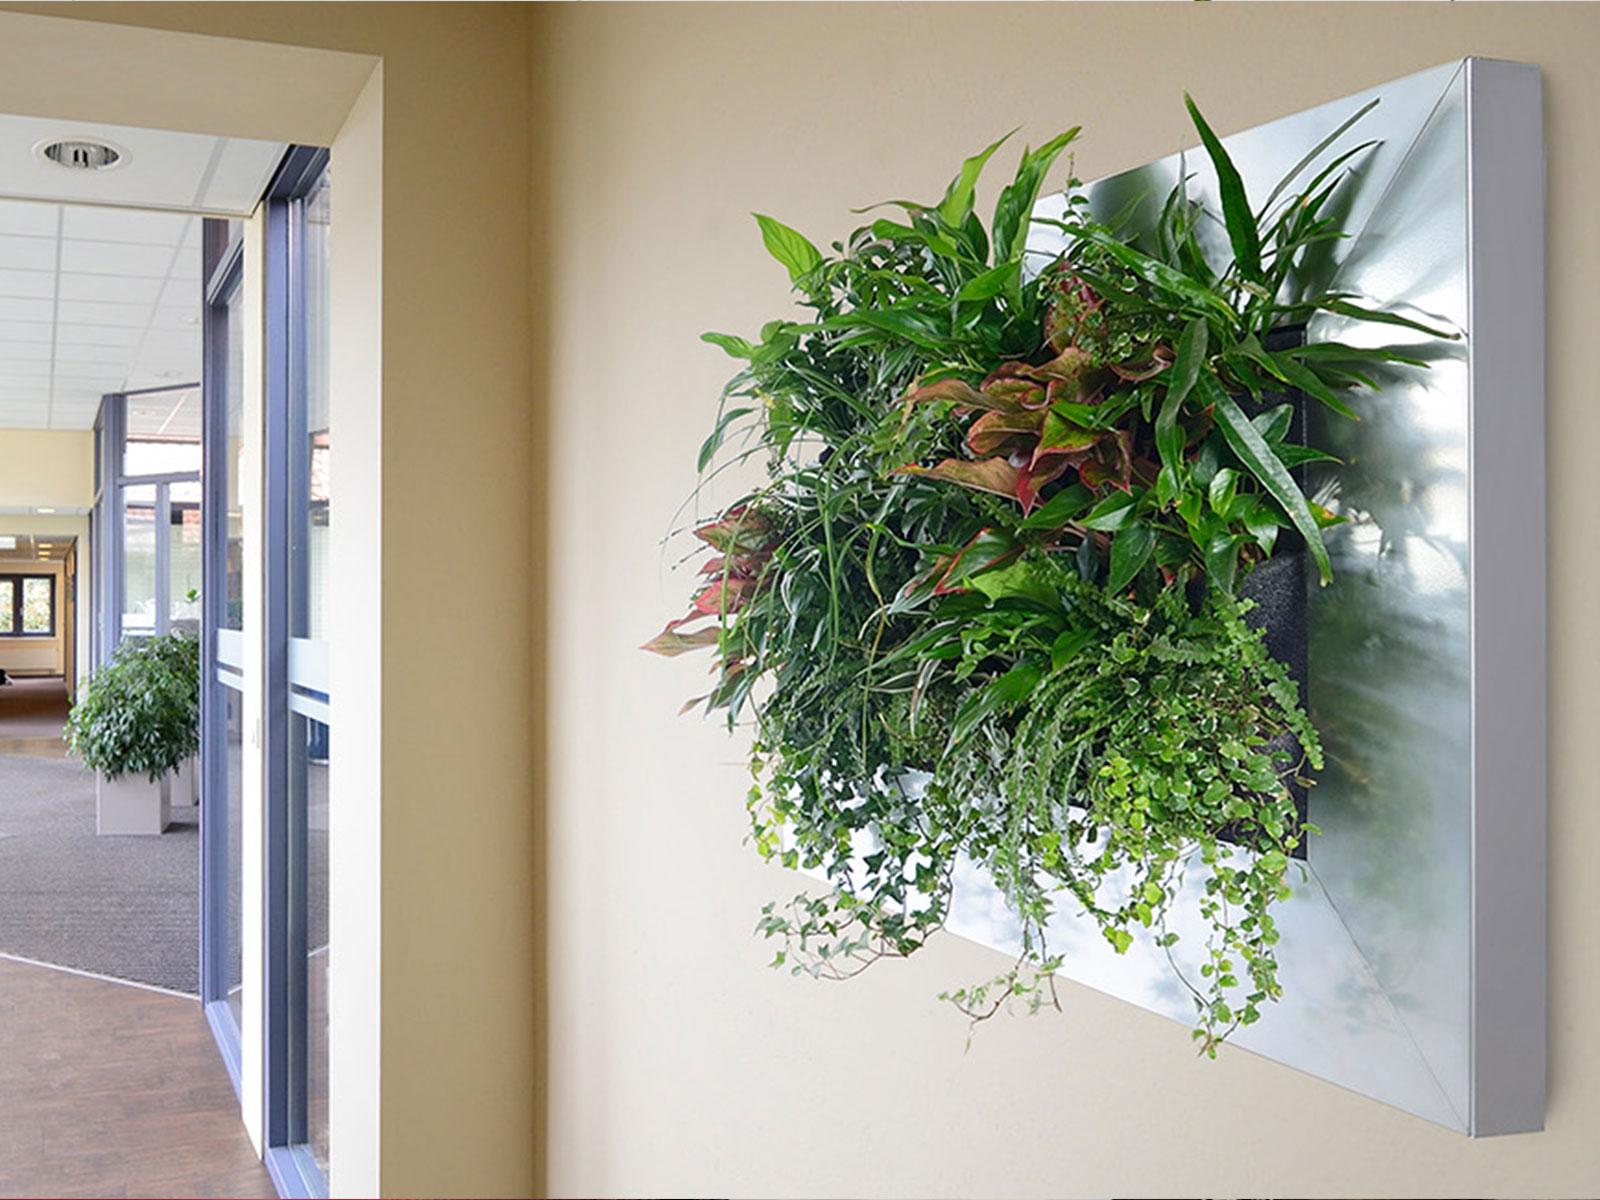 wandgarten selber bauen wunderbar b robegr nung sichtschutz b ropflanzen wandgarten zuhause. Black Bedroom Furniture Sets. Home Design Ideas